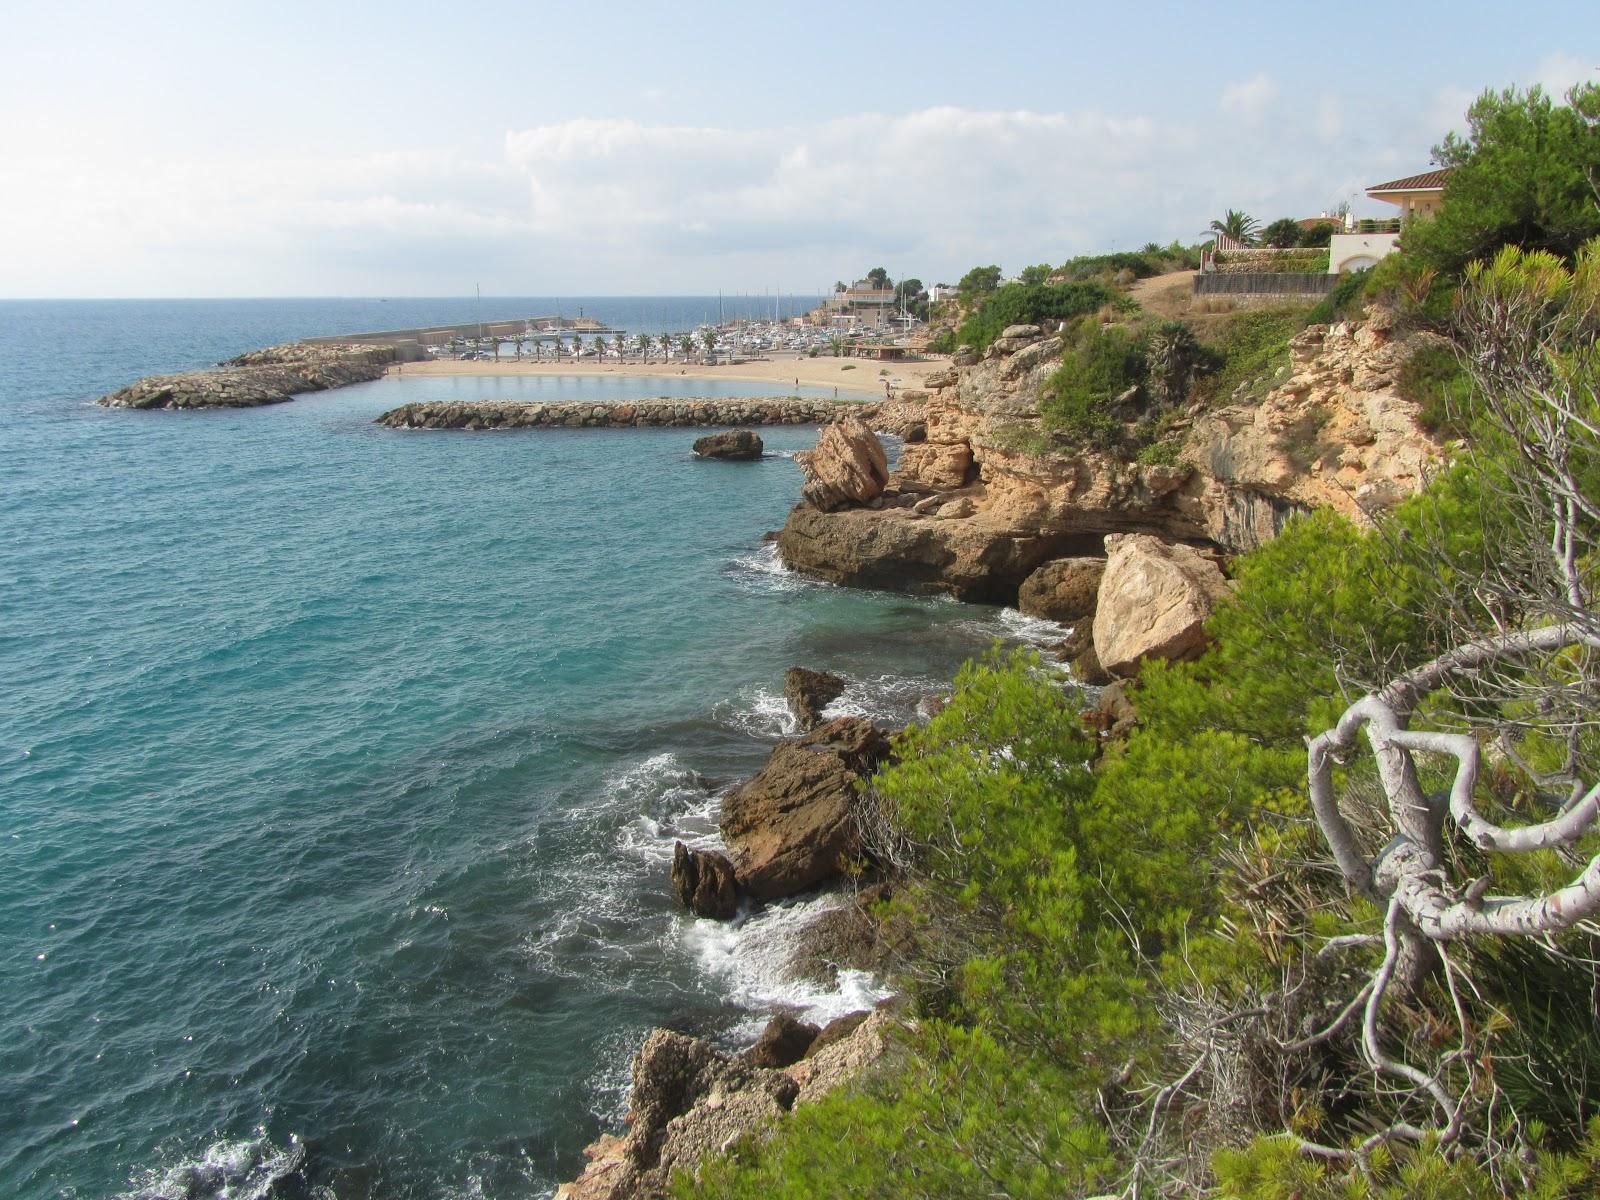 Playa Cala Trebol / Cala Lo Ribellet